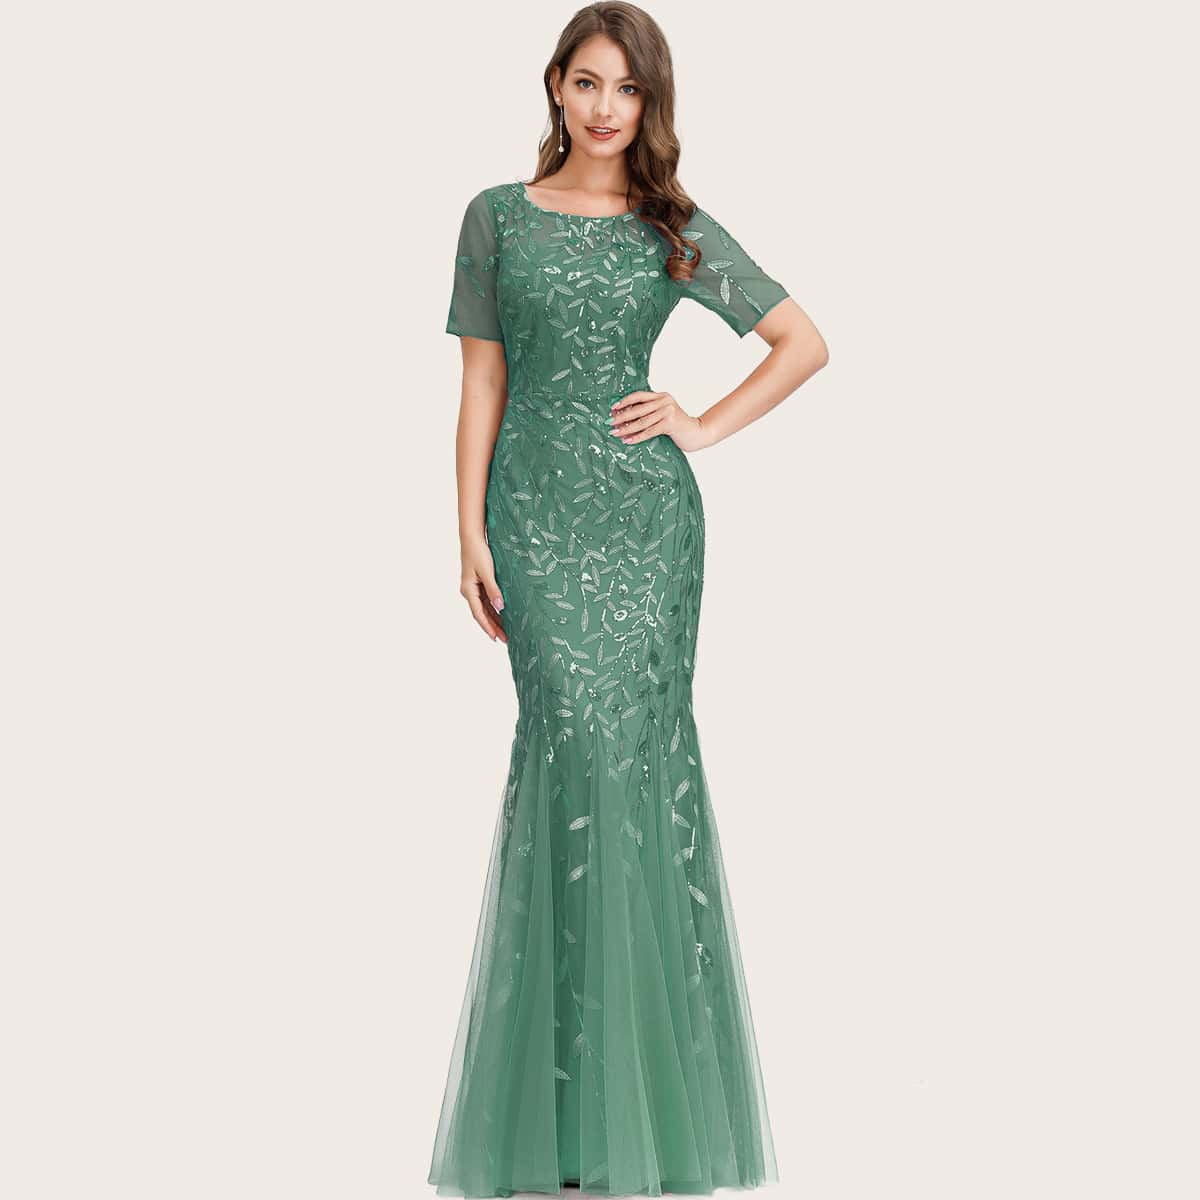 EverPretty Сетчатое платье-русалка с блестками фото